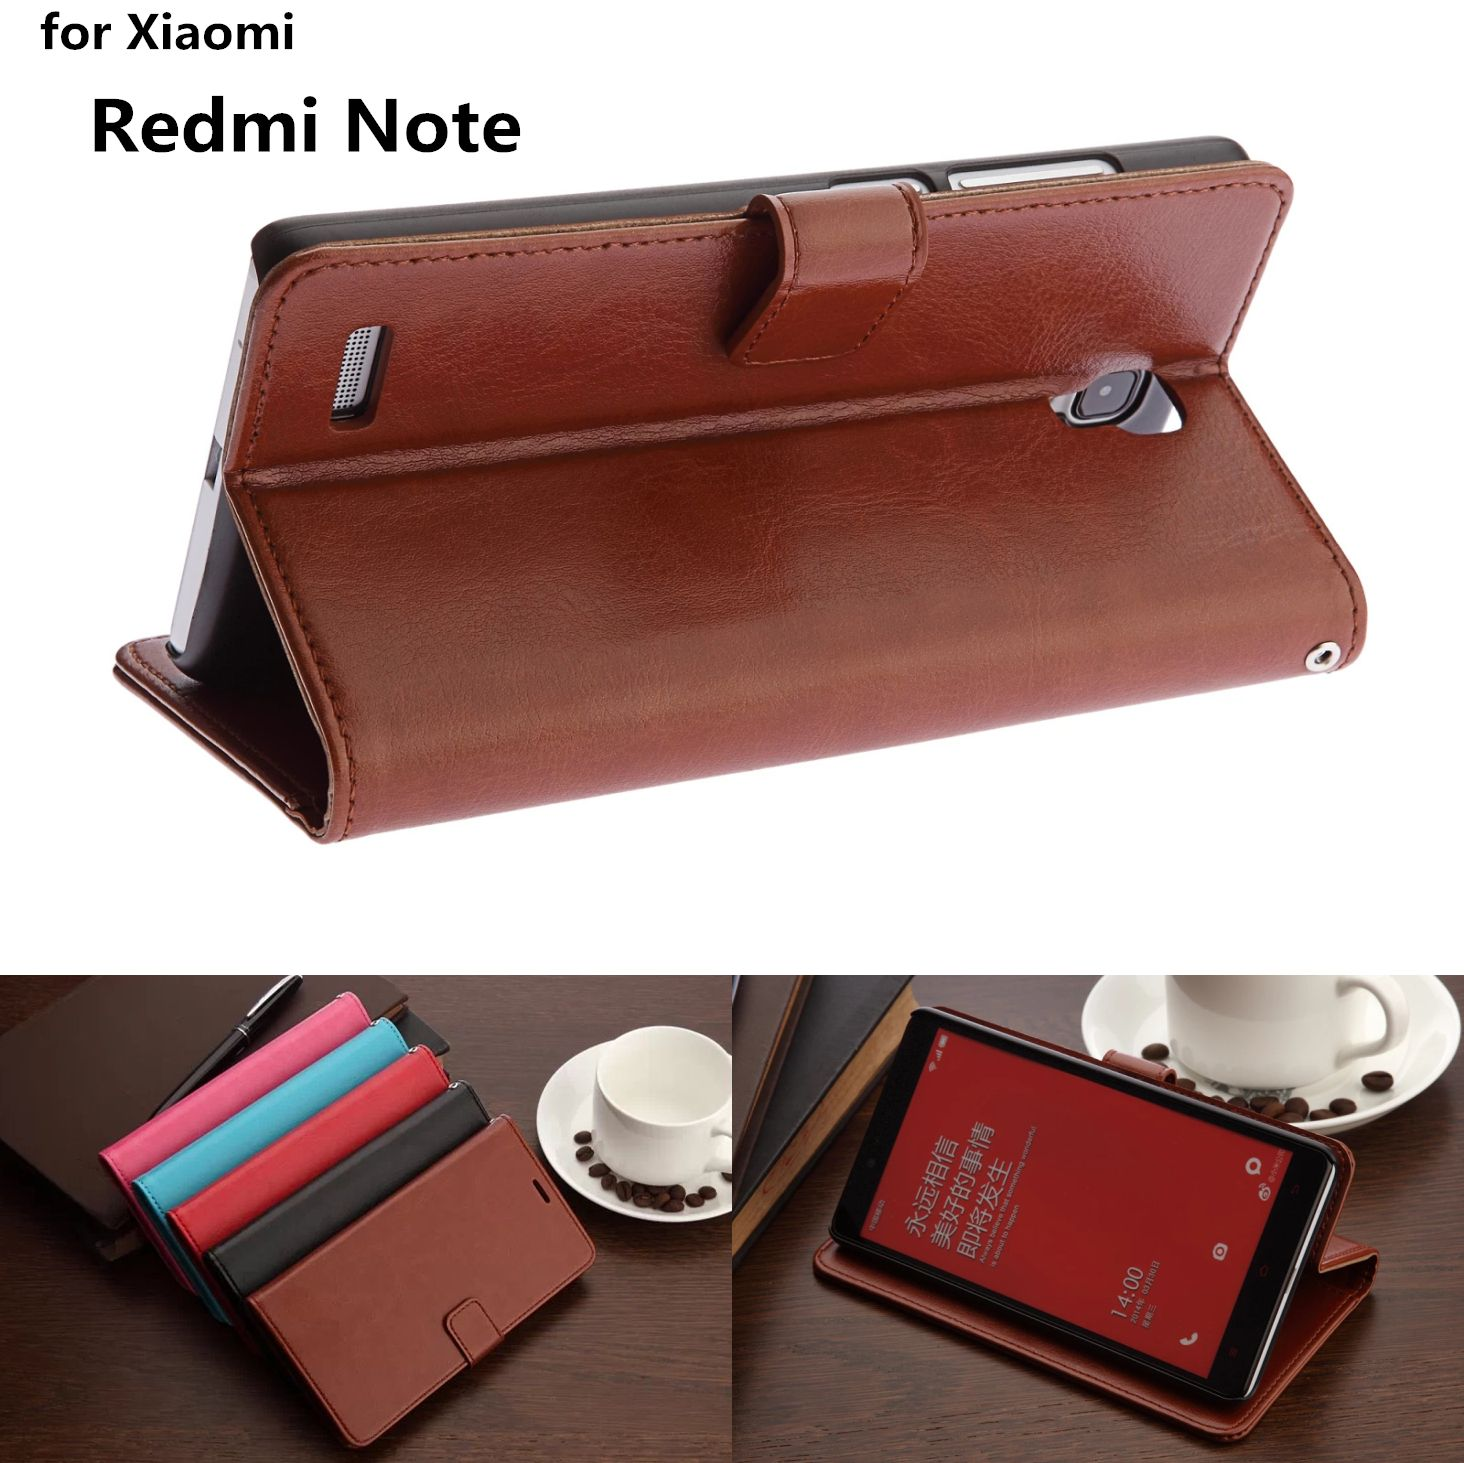 hot sale online 4951d bbc40 Xiaomi HM Note card holder cover case for Xiaomi Redmi Note 1 LTE 4G ...